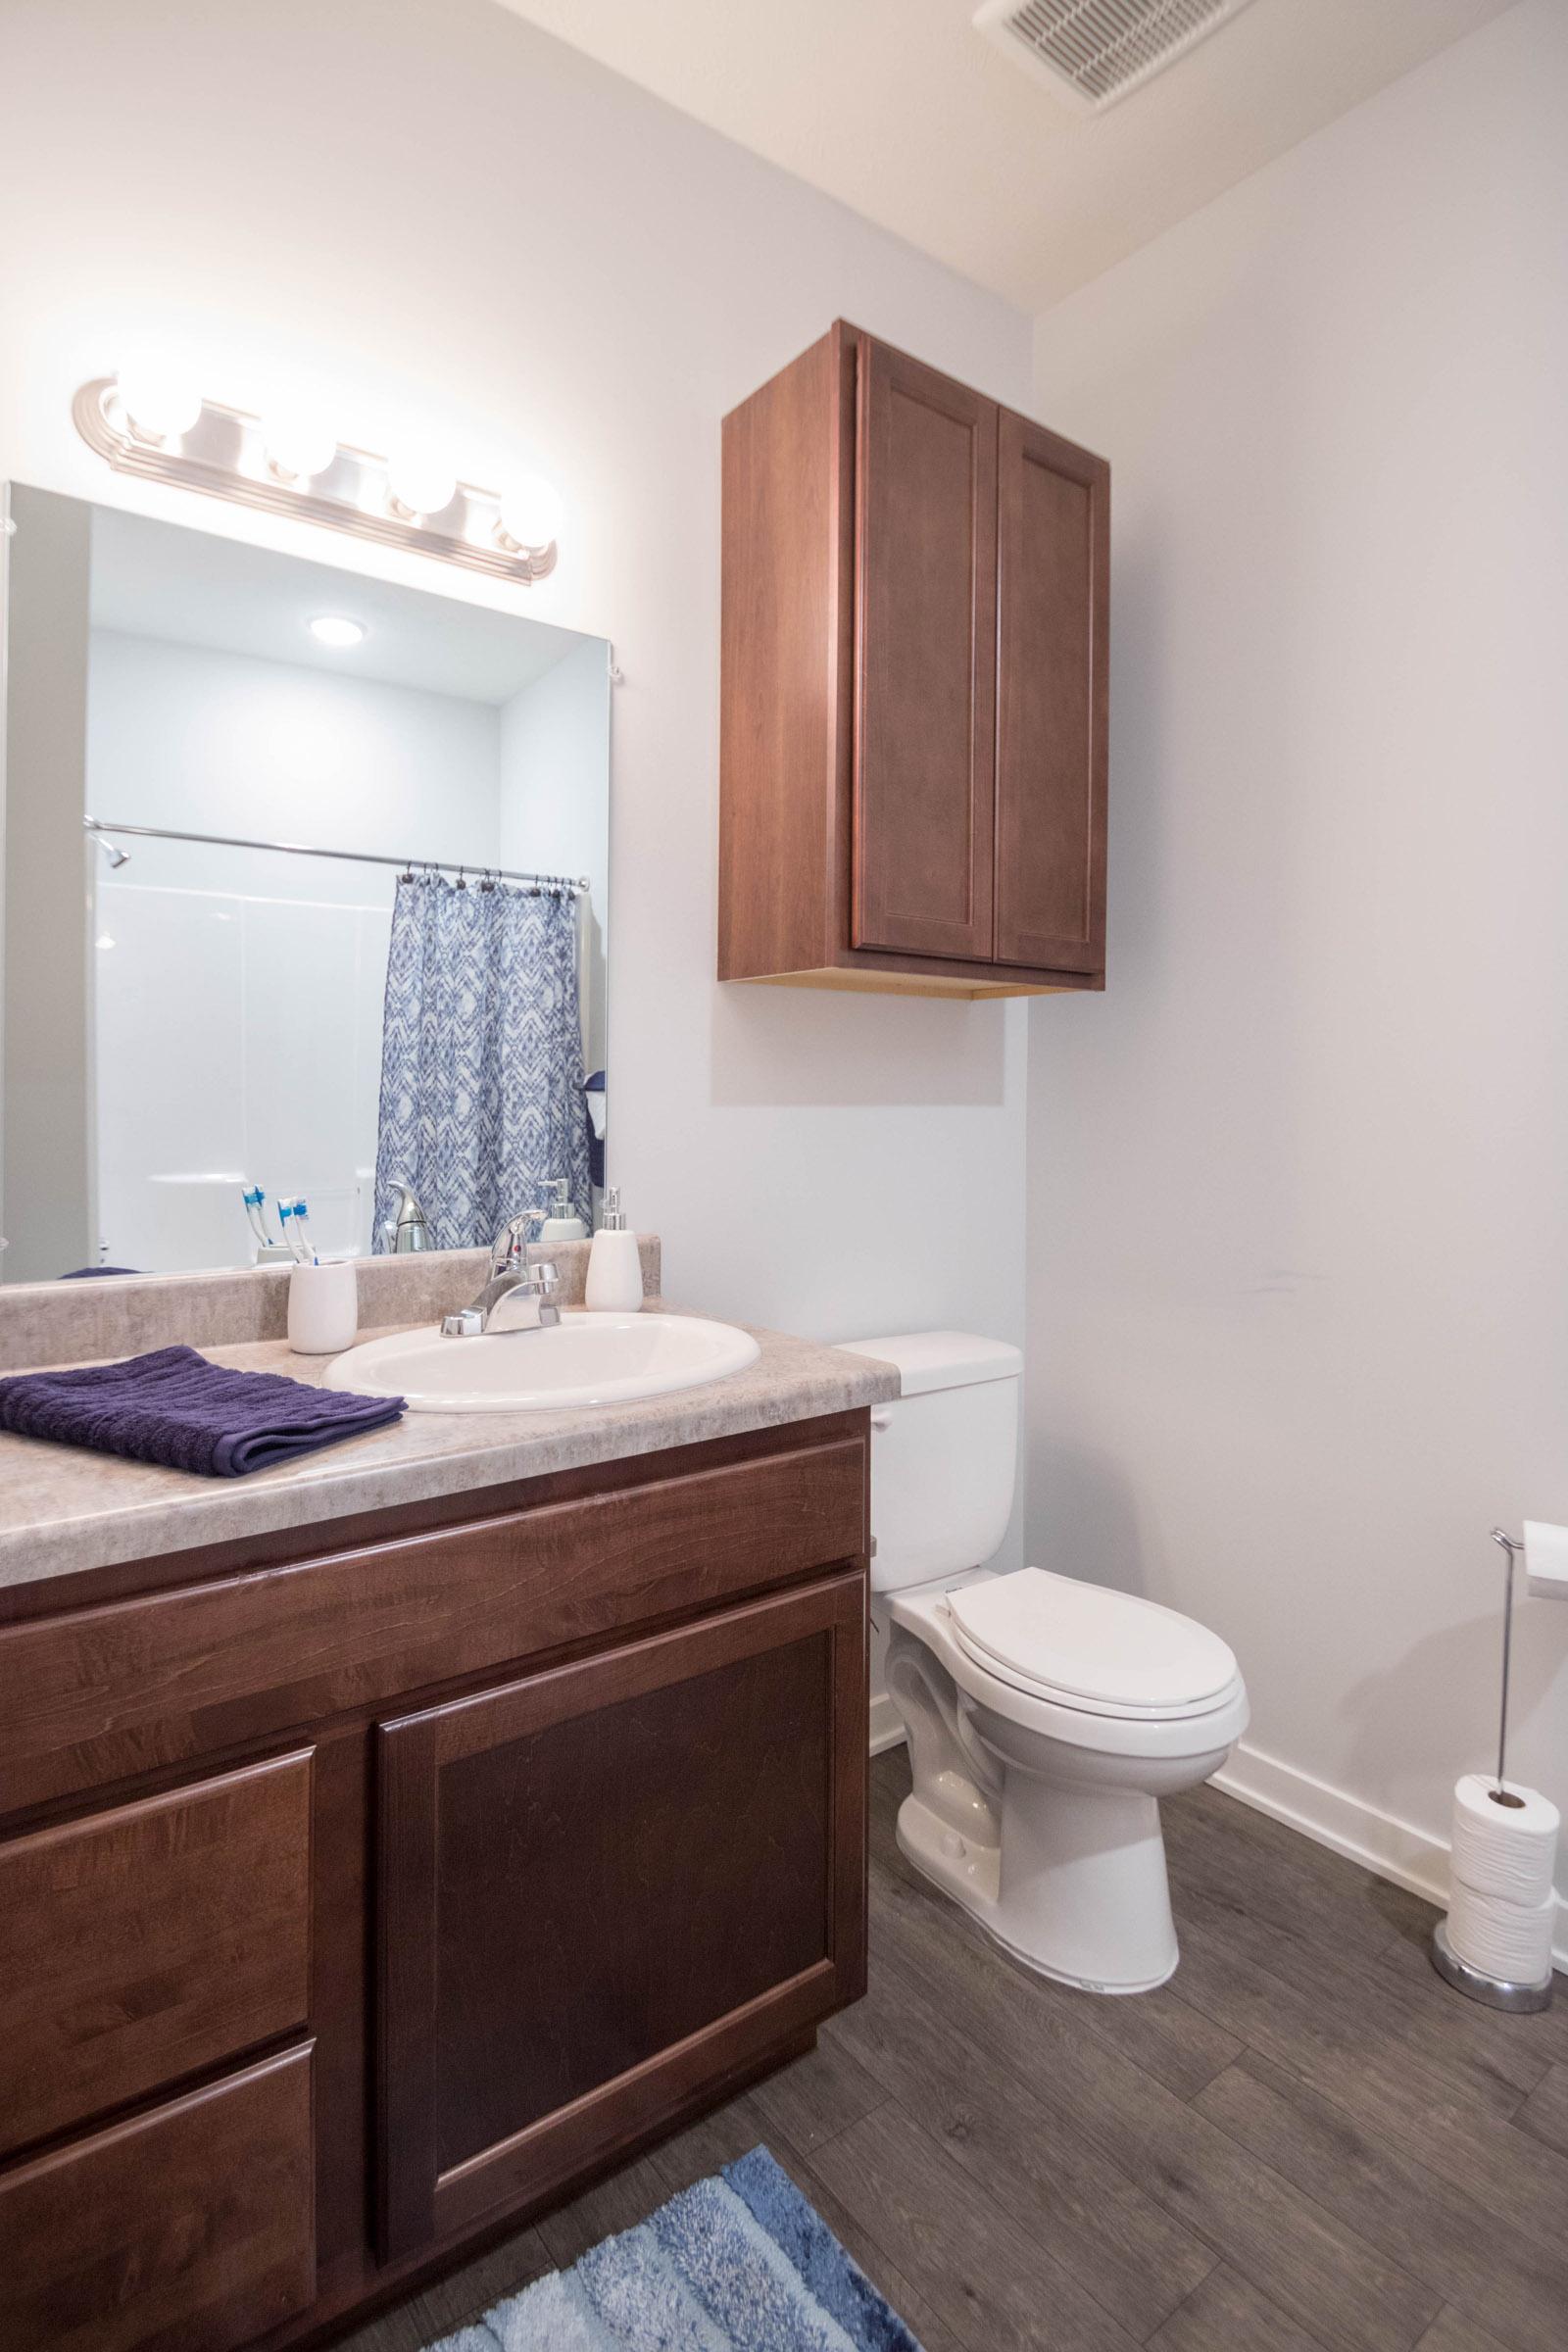 Sleek Wood Floors at Aspen Grove Apartments in Omaha, NE